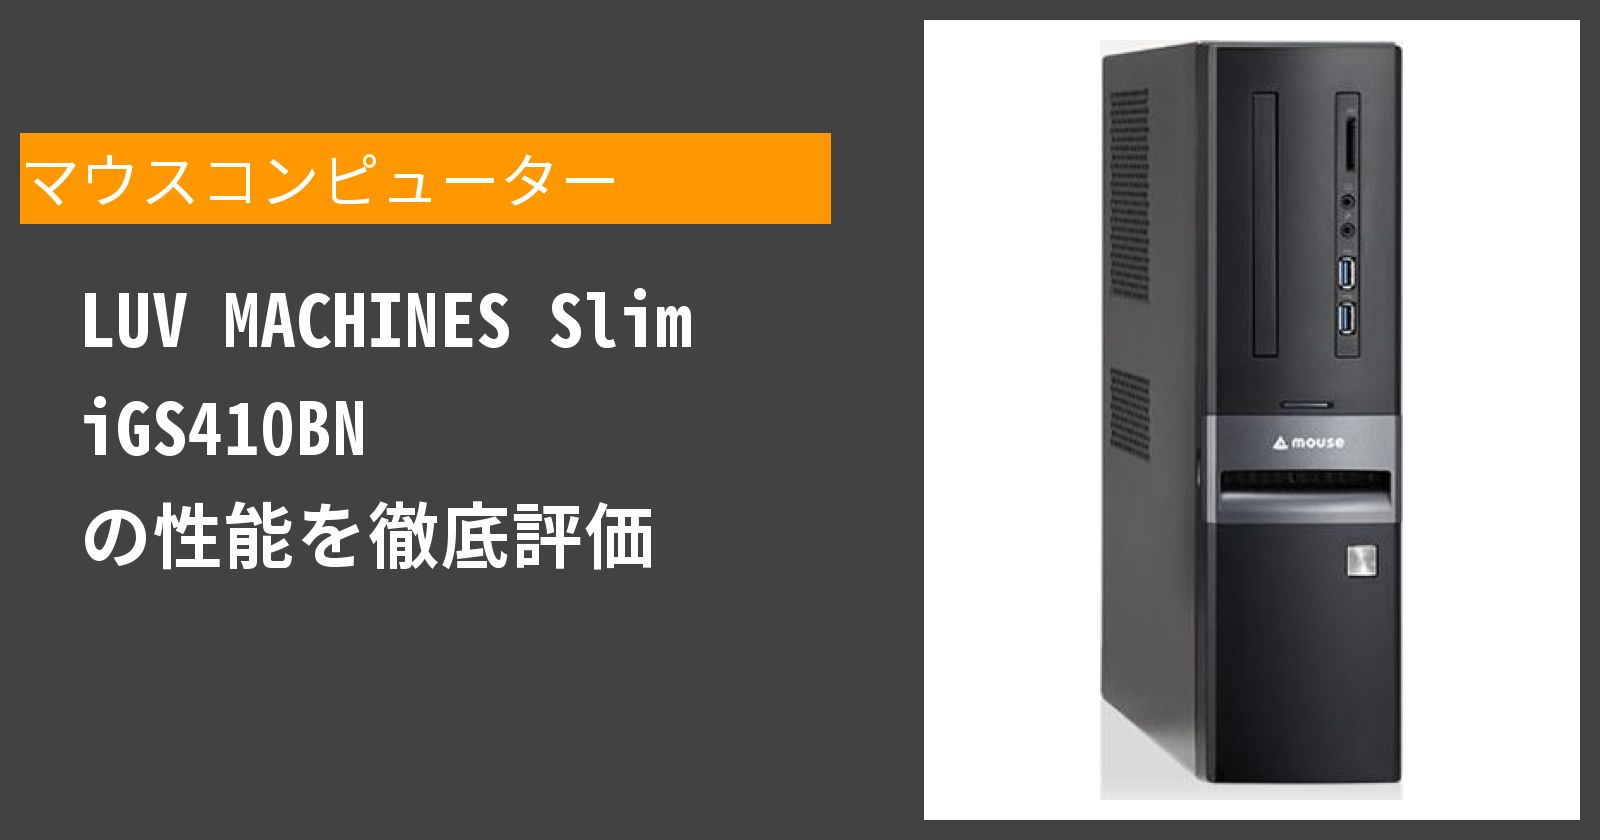 LUV MACHINES Slim iGS410BN の性能を徹底評価